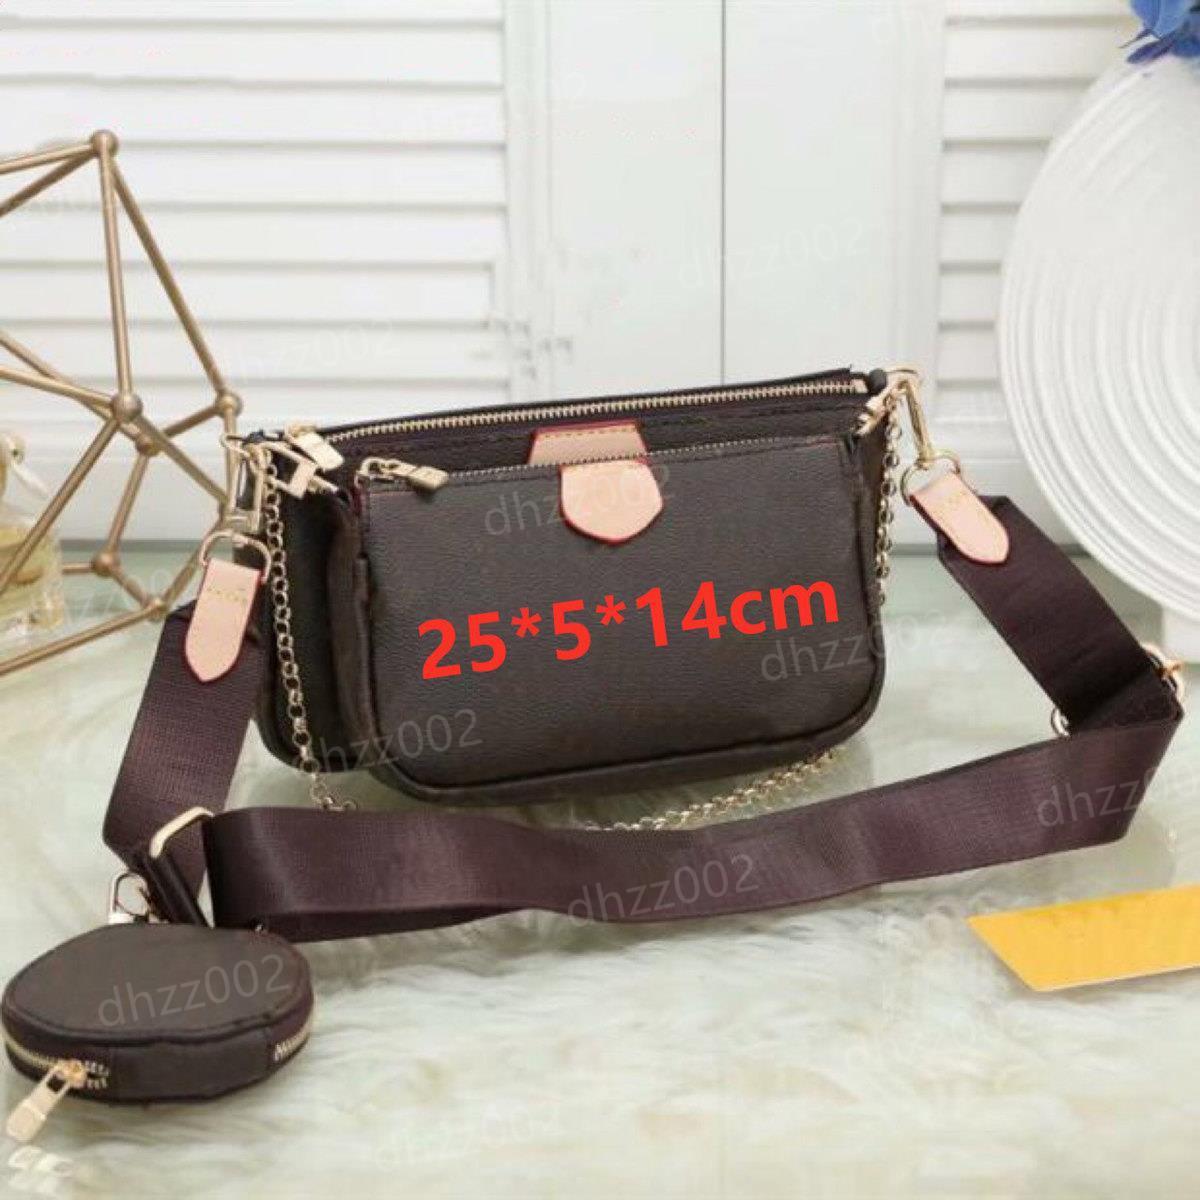 Bolsa Mulheres Bolsas Multi Pochesa Bag Corrente Crossbody Bag Moda Pequeno Ombro Bag 3 Pcs Bolsa Multi Cor Coreiras Ergegr